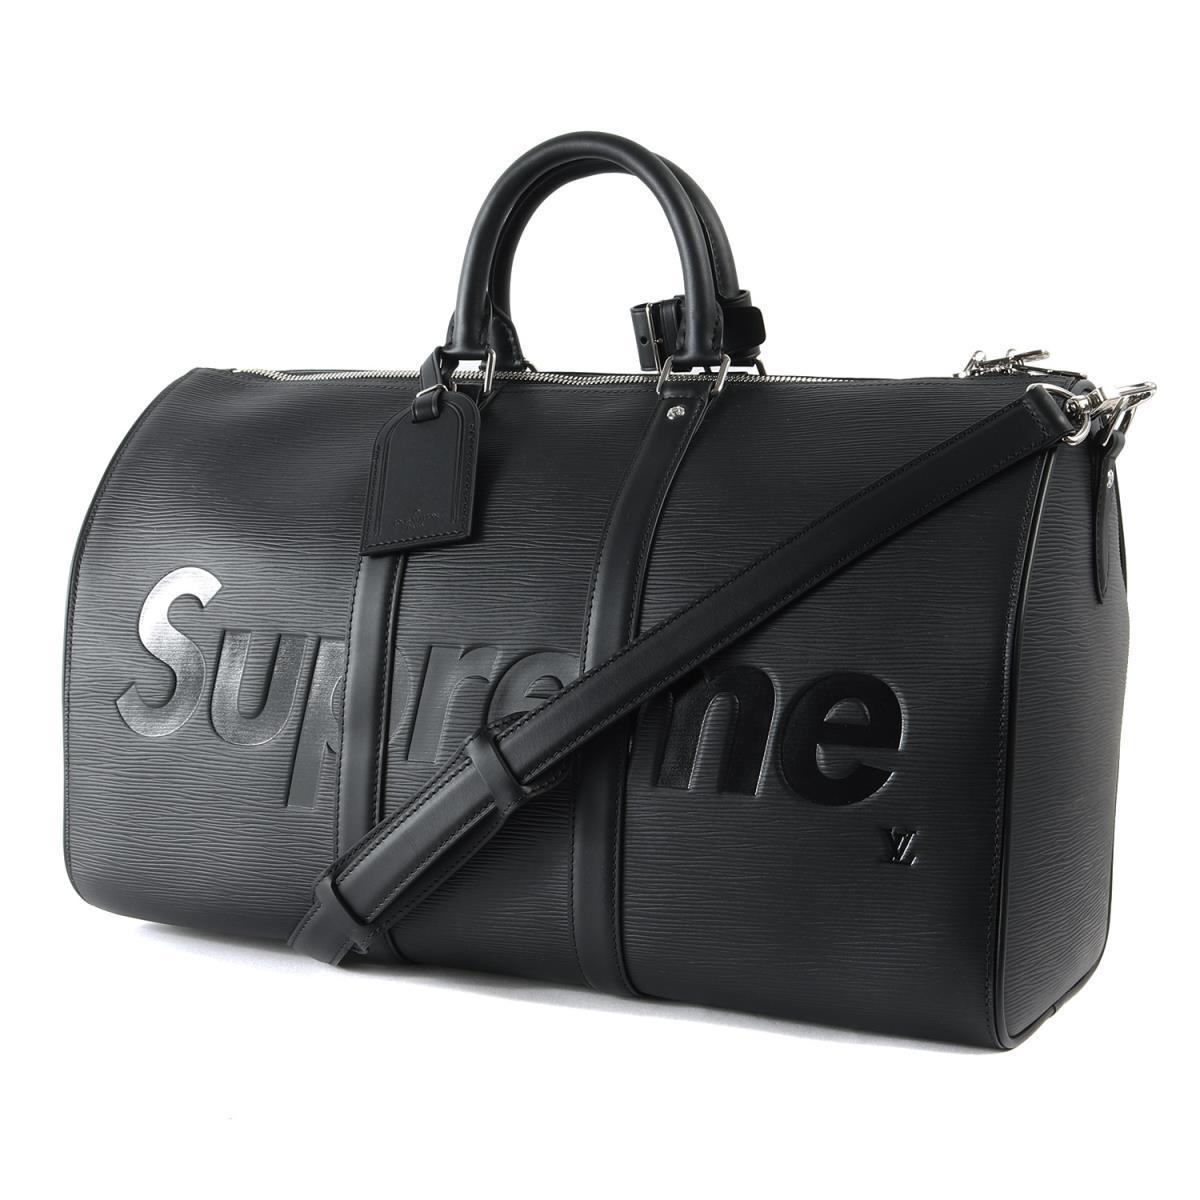 Supreme (シュプリーム) 17A/W ×LOUIS VUITTON エピレザーキーポルボストンバッグ(KEEP.45 BA.SP EPI DWT) ブラック 45 【メンズ】【K2351】【☆対応可】